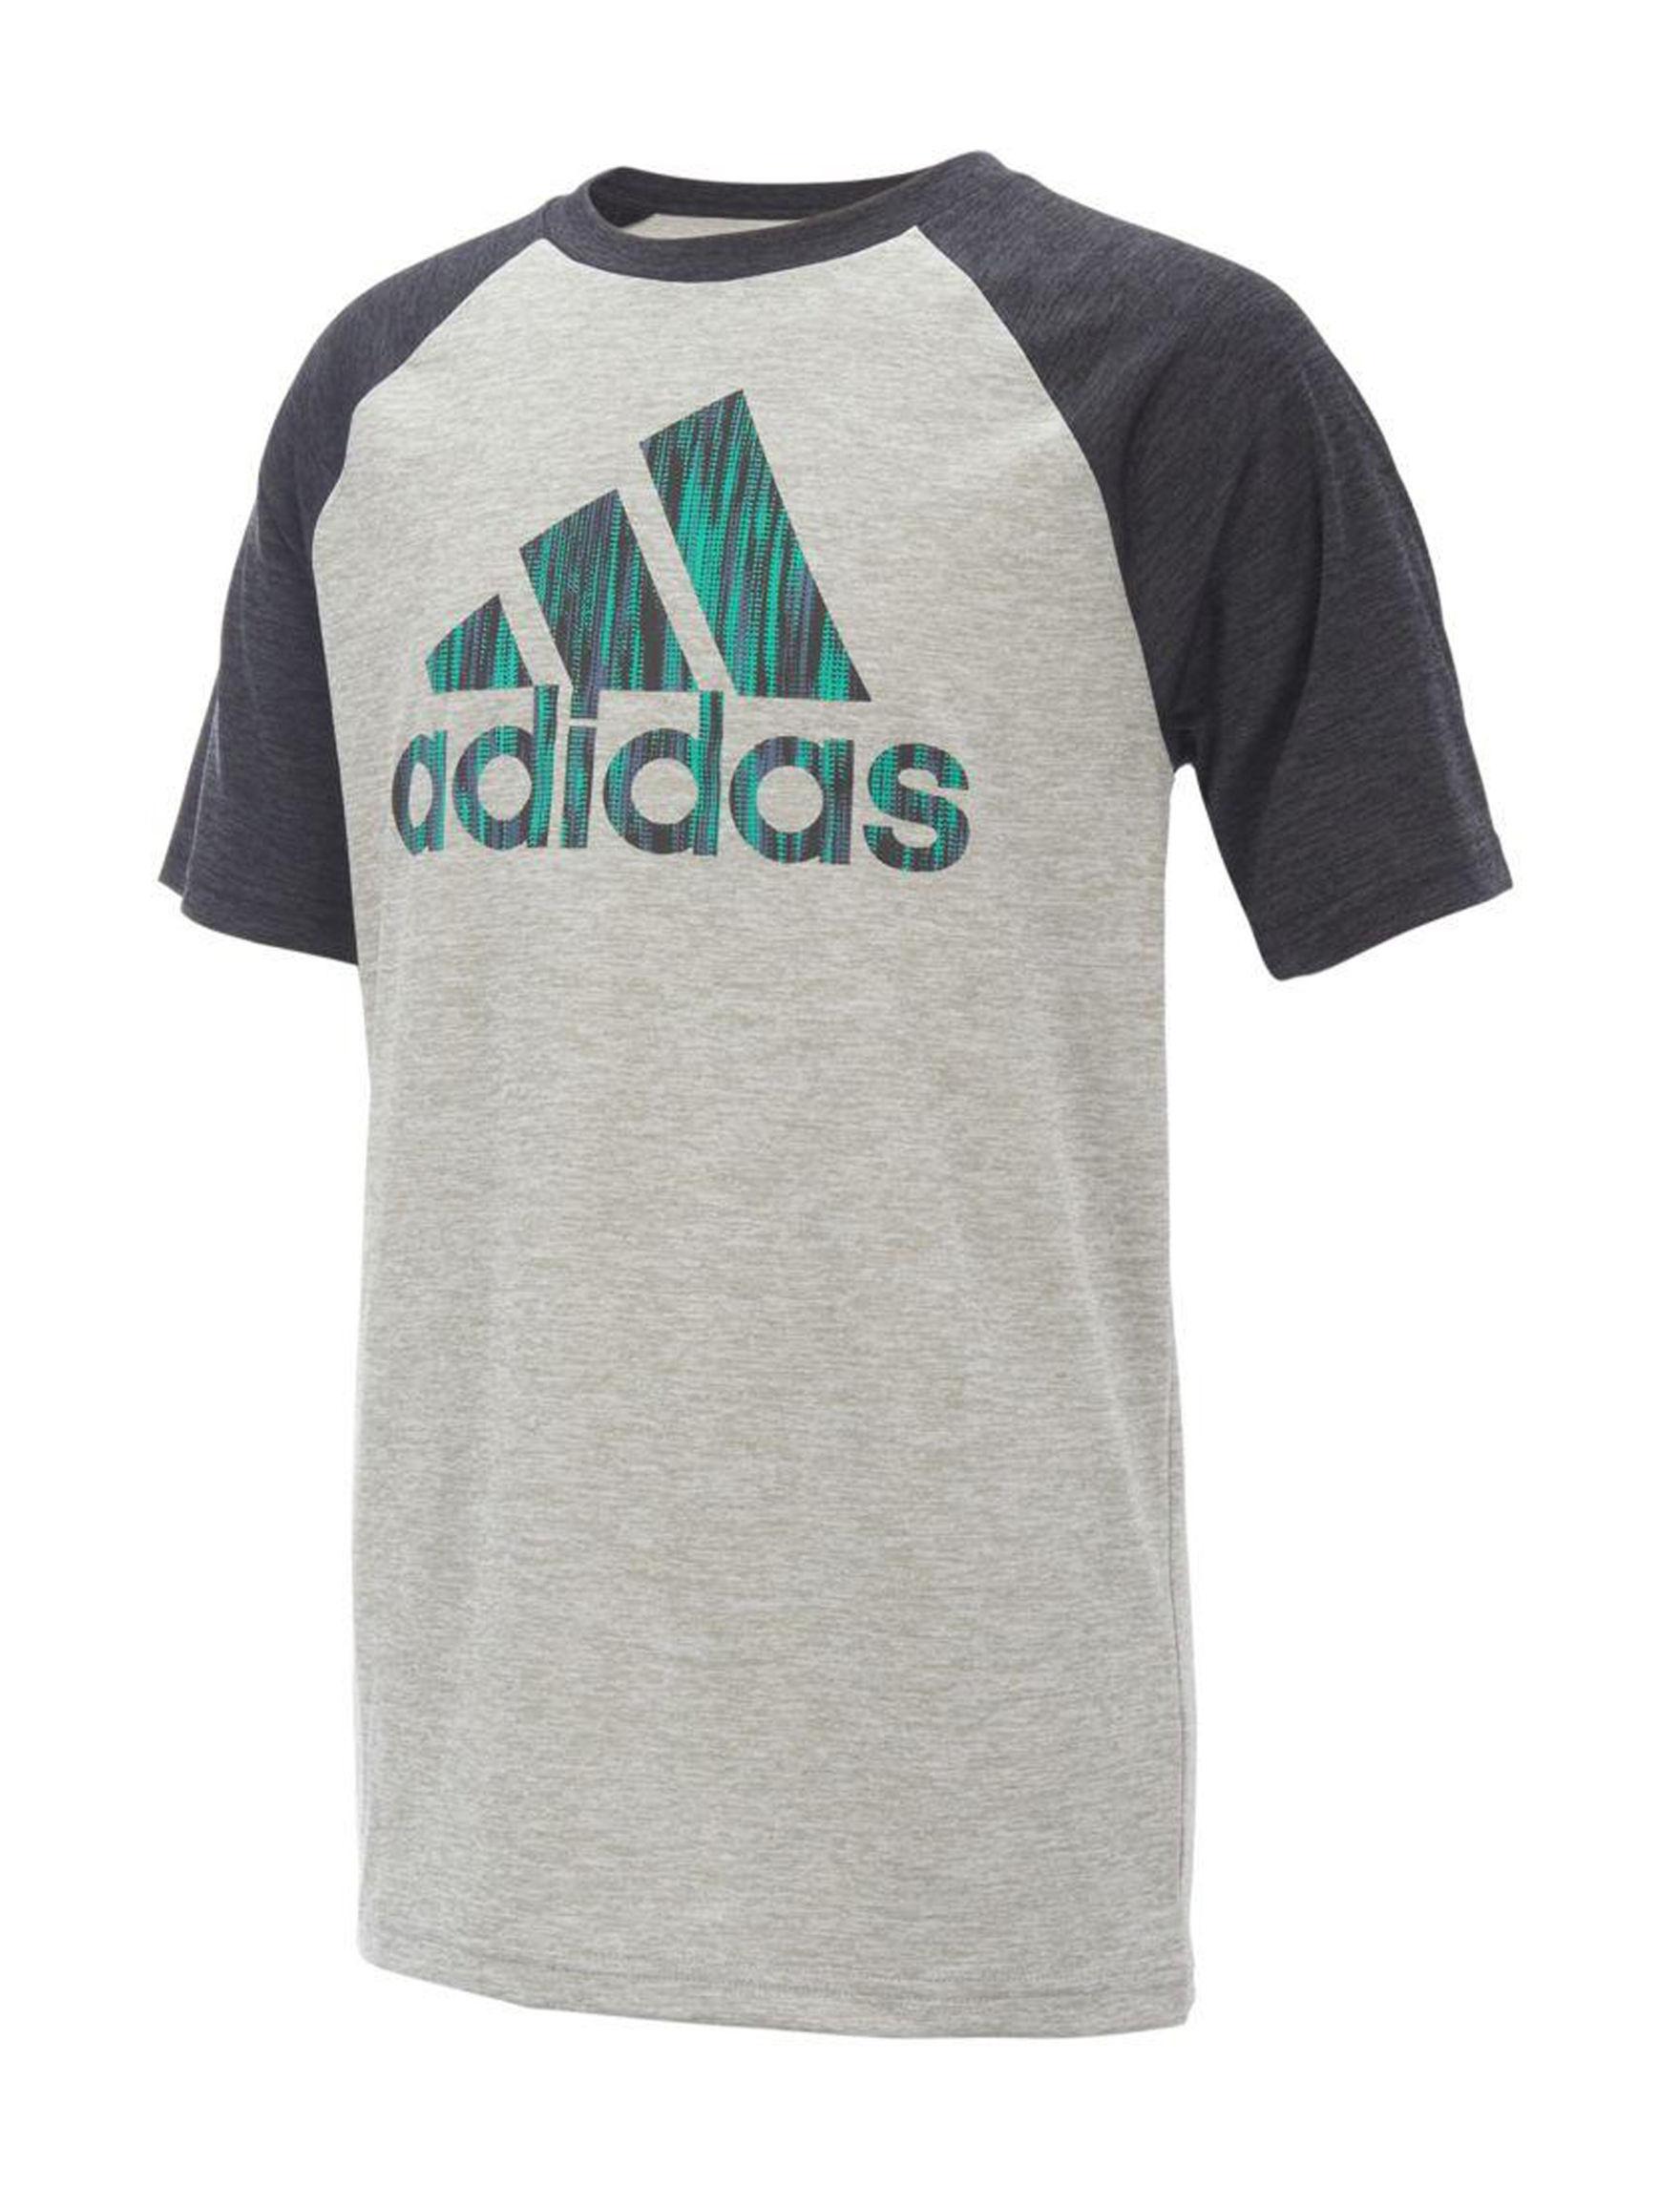 Adidas Grey Tees & Tanks